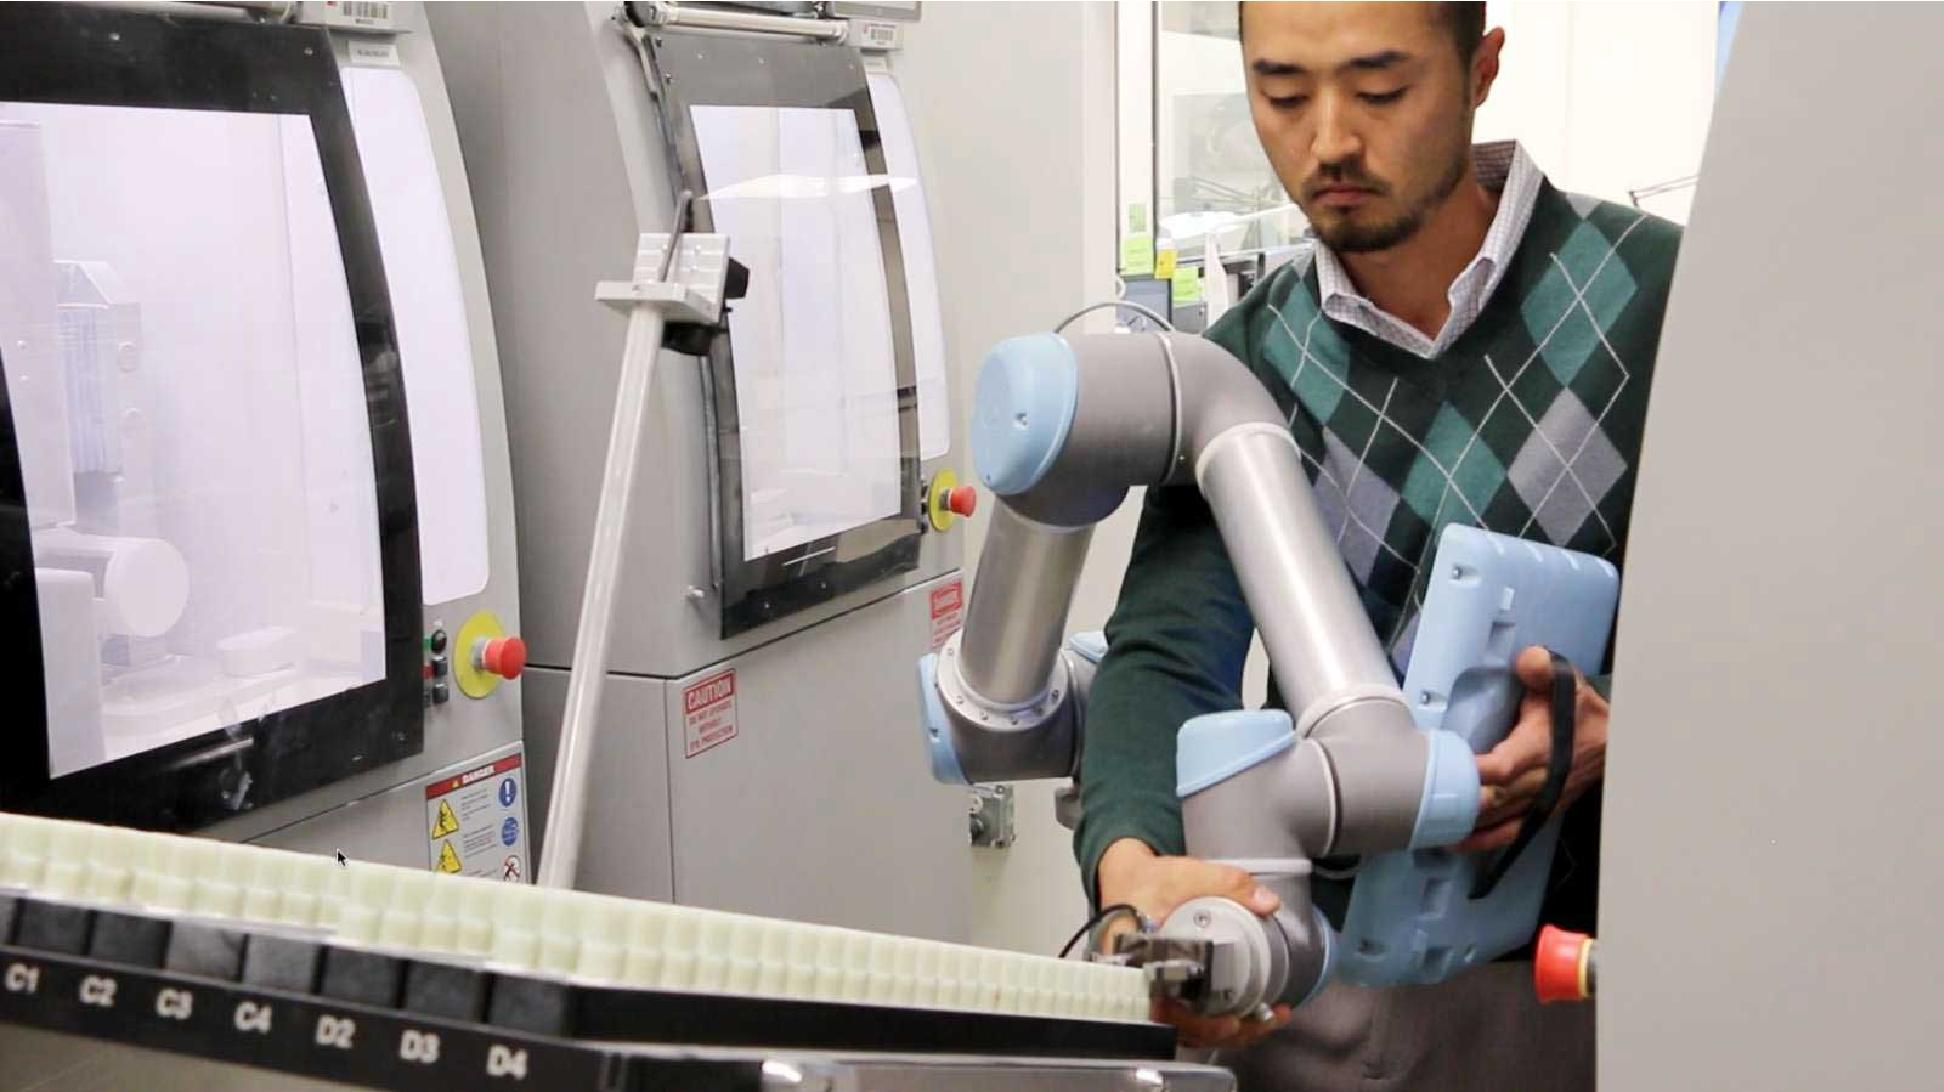 Universal Robots CNC machine tending with ActiNav bin picking solution